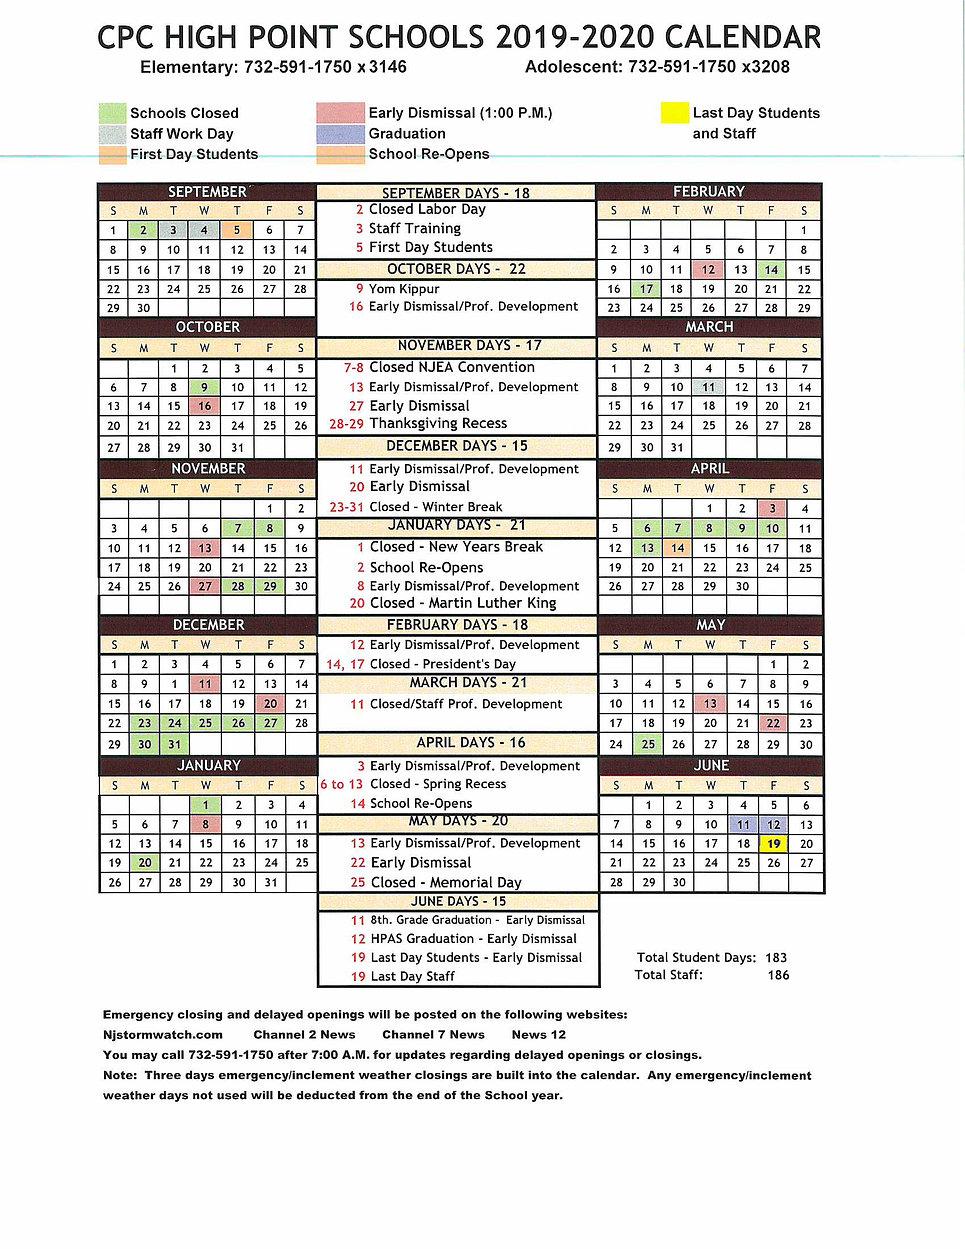 2019-2020 School Calendar jpeg.jpg